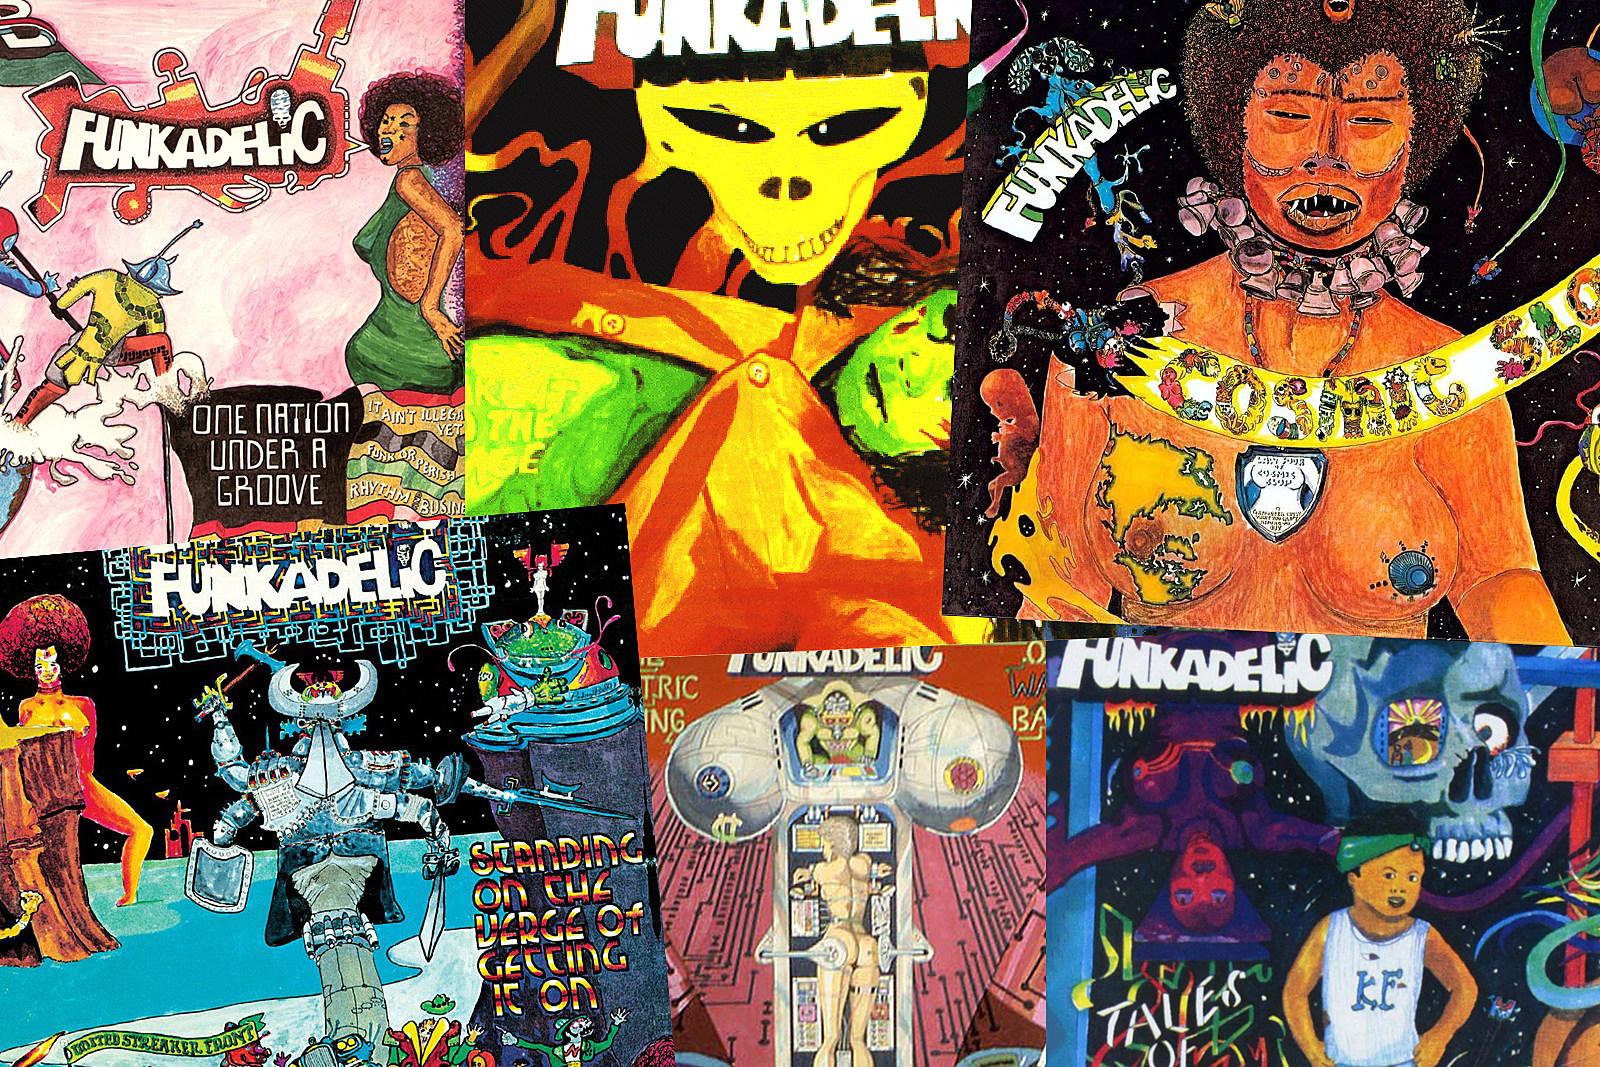 Funkadelic Album Cover Artist Pedro Bell Dies